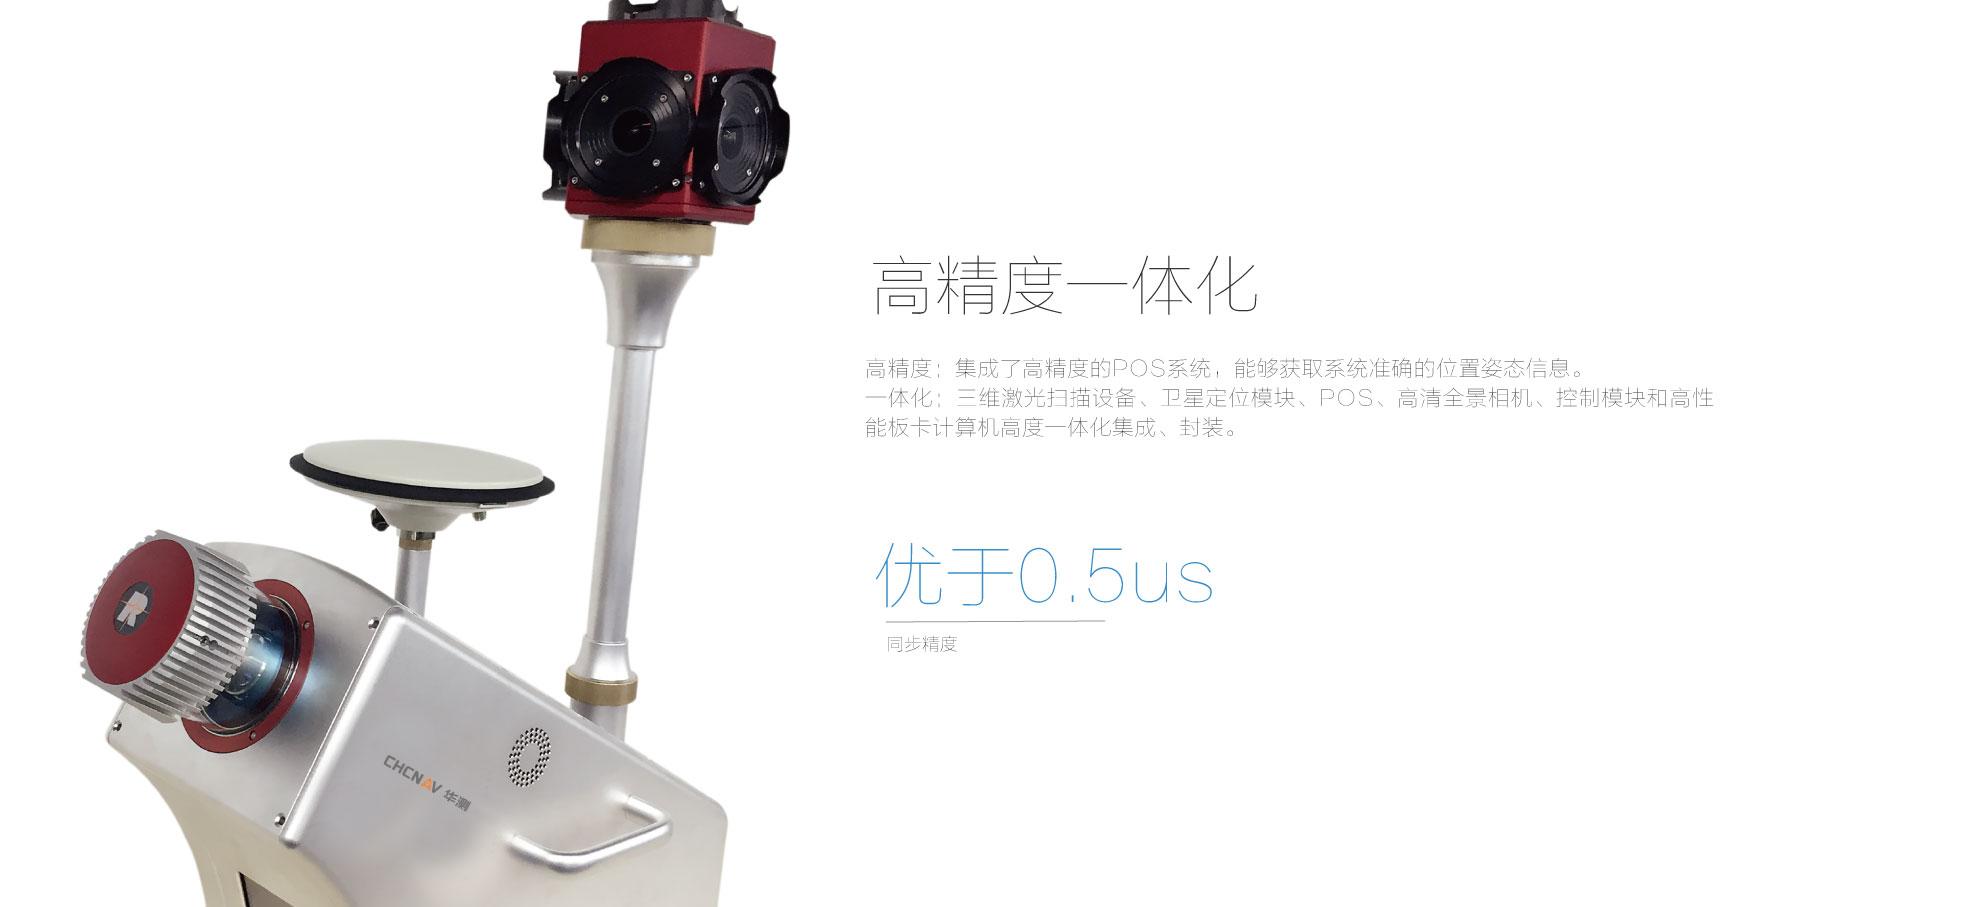 MS-900车载激光扫描测量系统